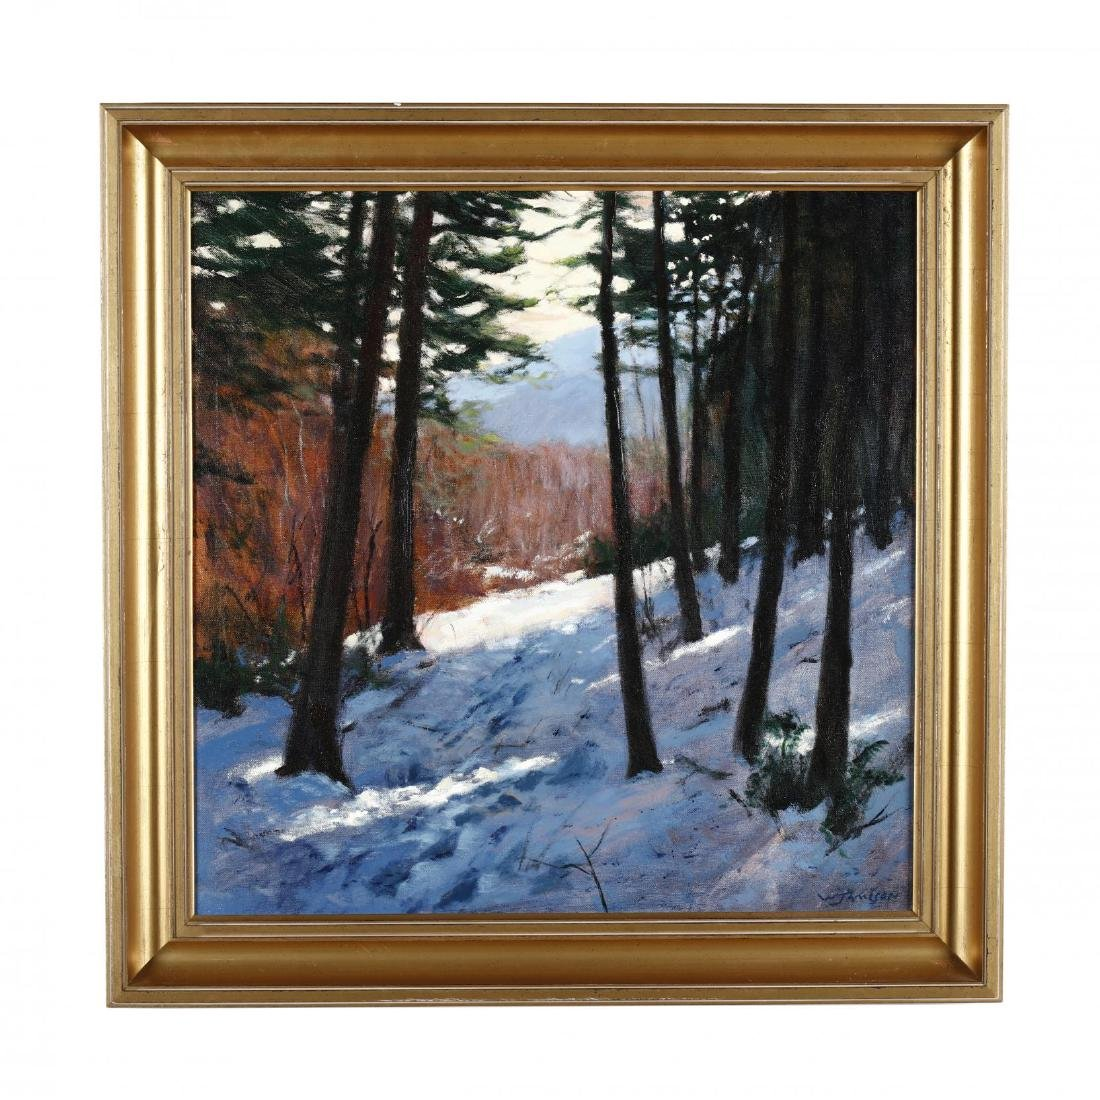 William Jameson (SC, b. 1944), Winter Landscape